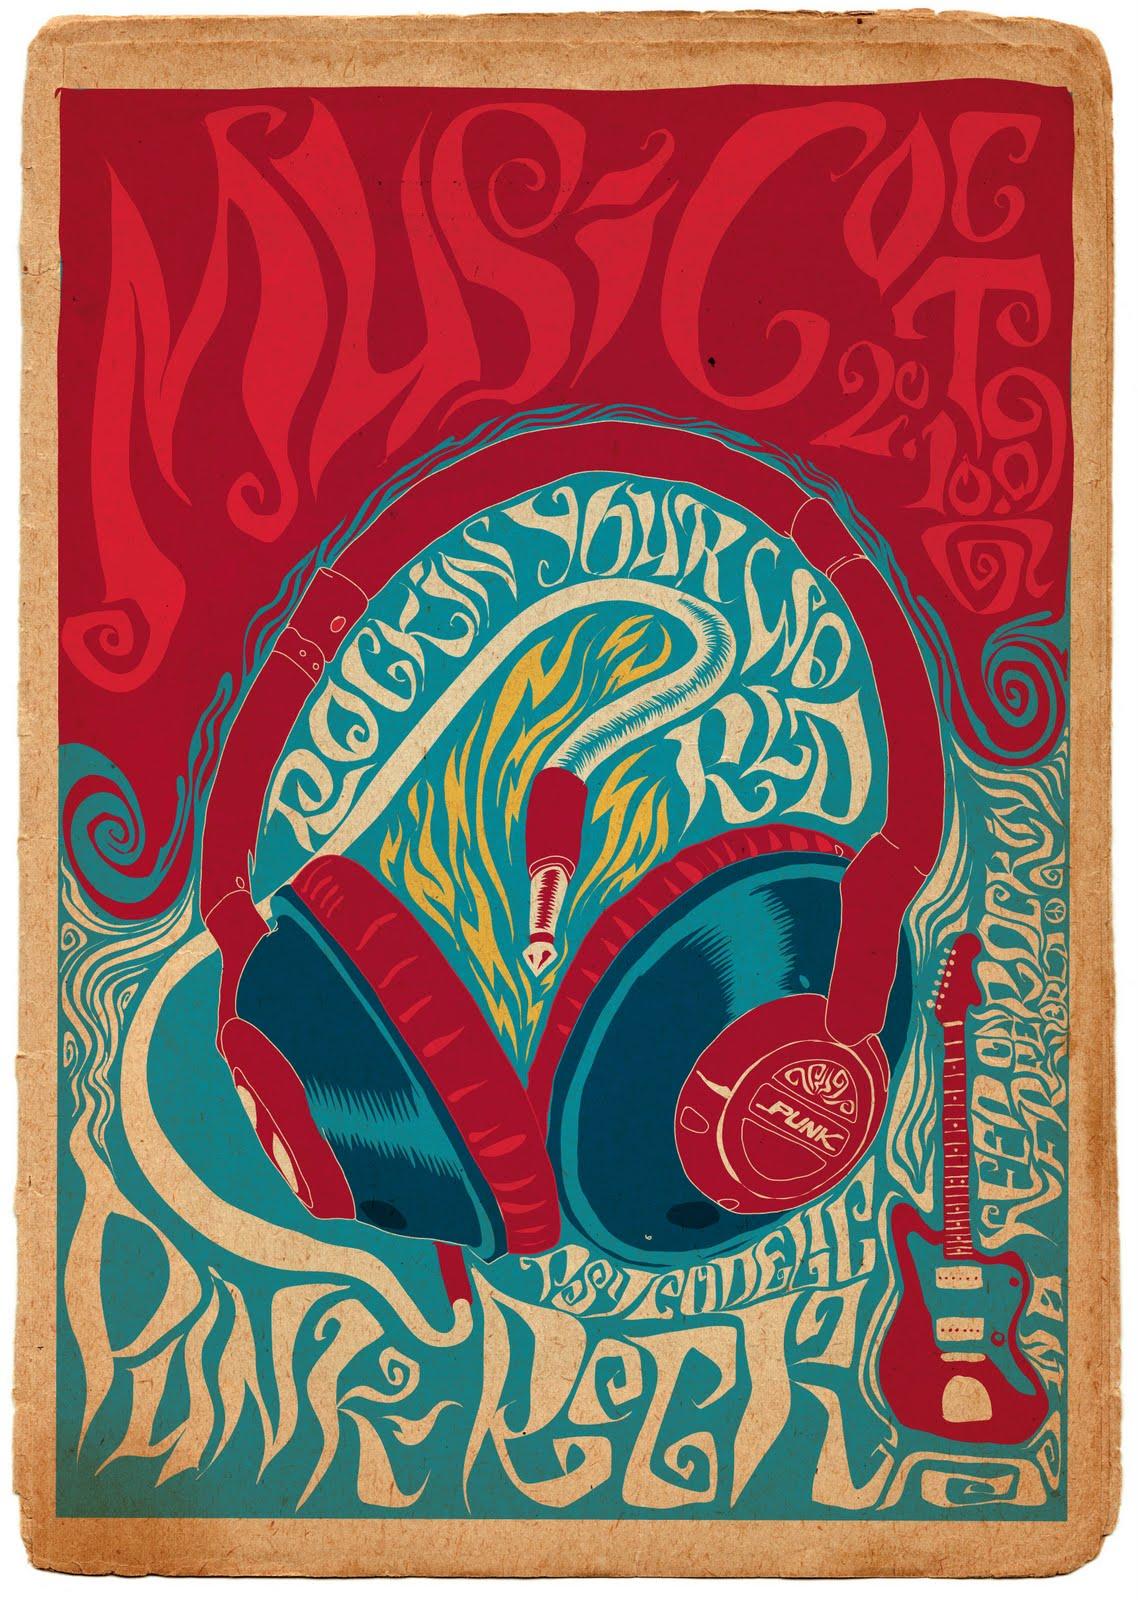 Drawn poster soul music Spraygraphic http://www Google spraygraphic com/storage2/member_files/2273/picture/600_f1e28fe0b39496381e79ed68729f3a7b